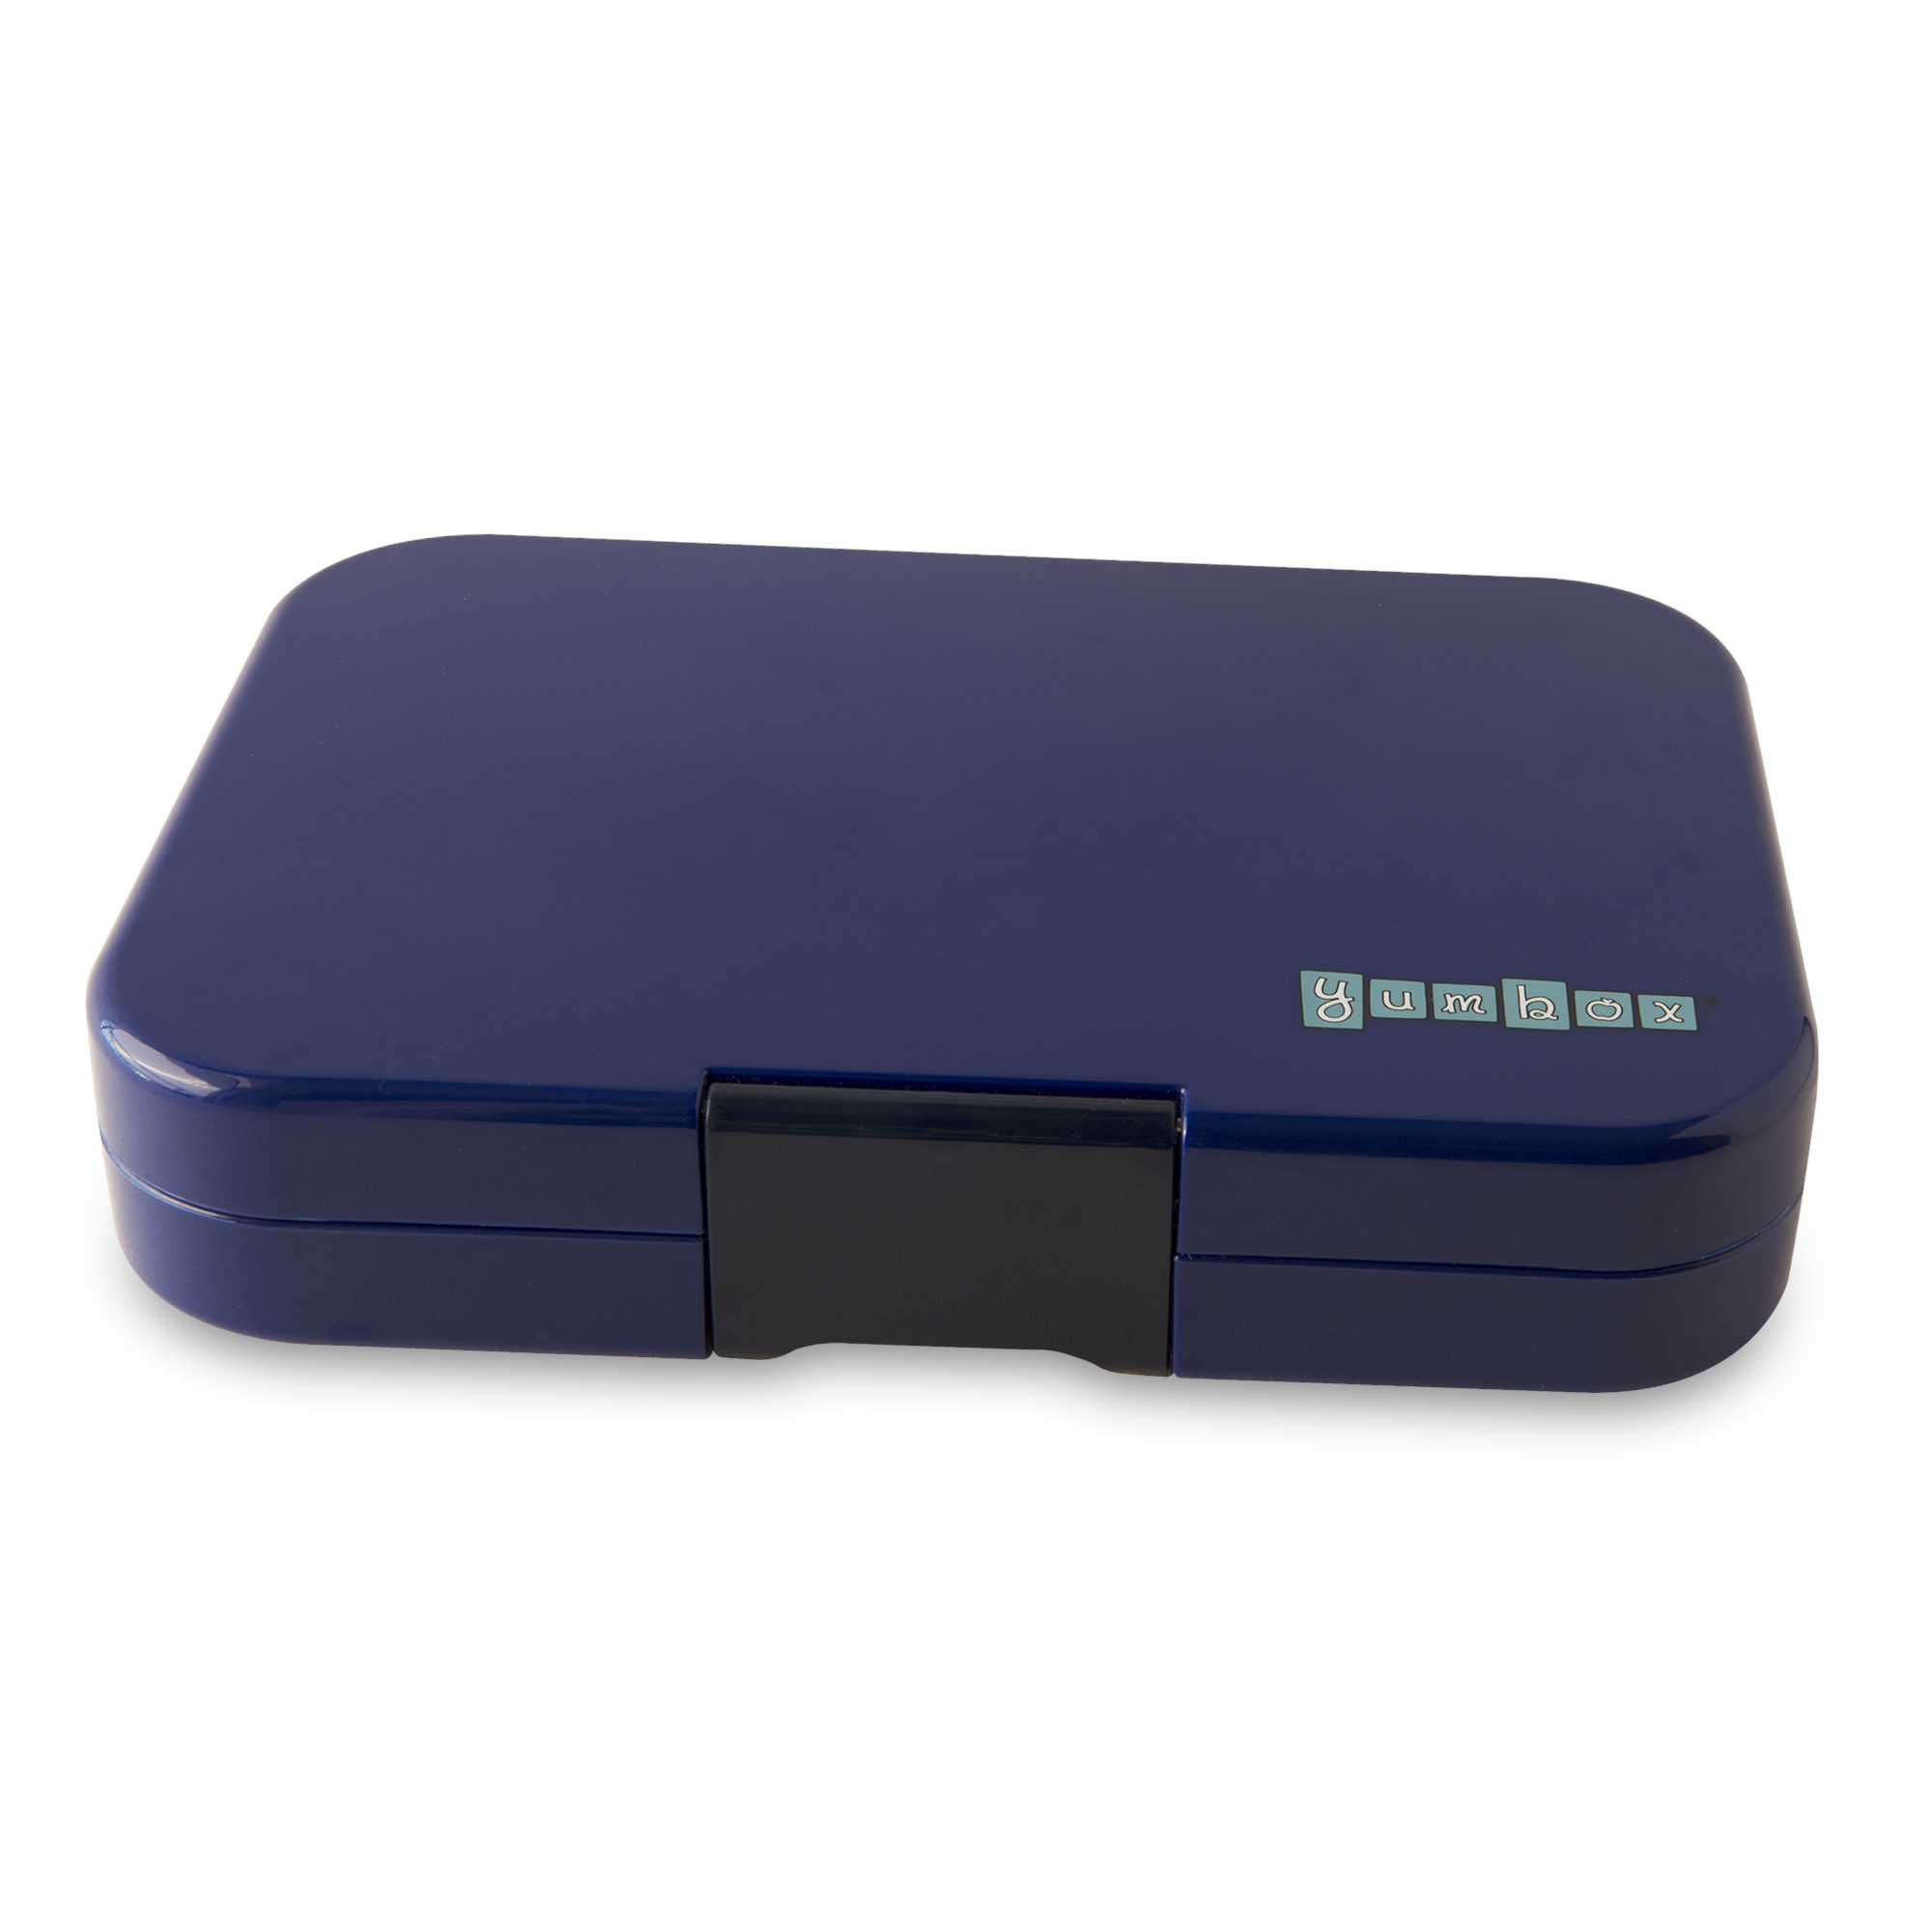 Yumbox Tapas XL broodtrommel Portofino blauw / Bon appetit 5 vakken-3